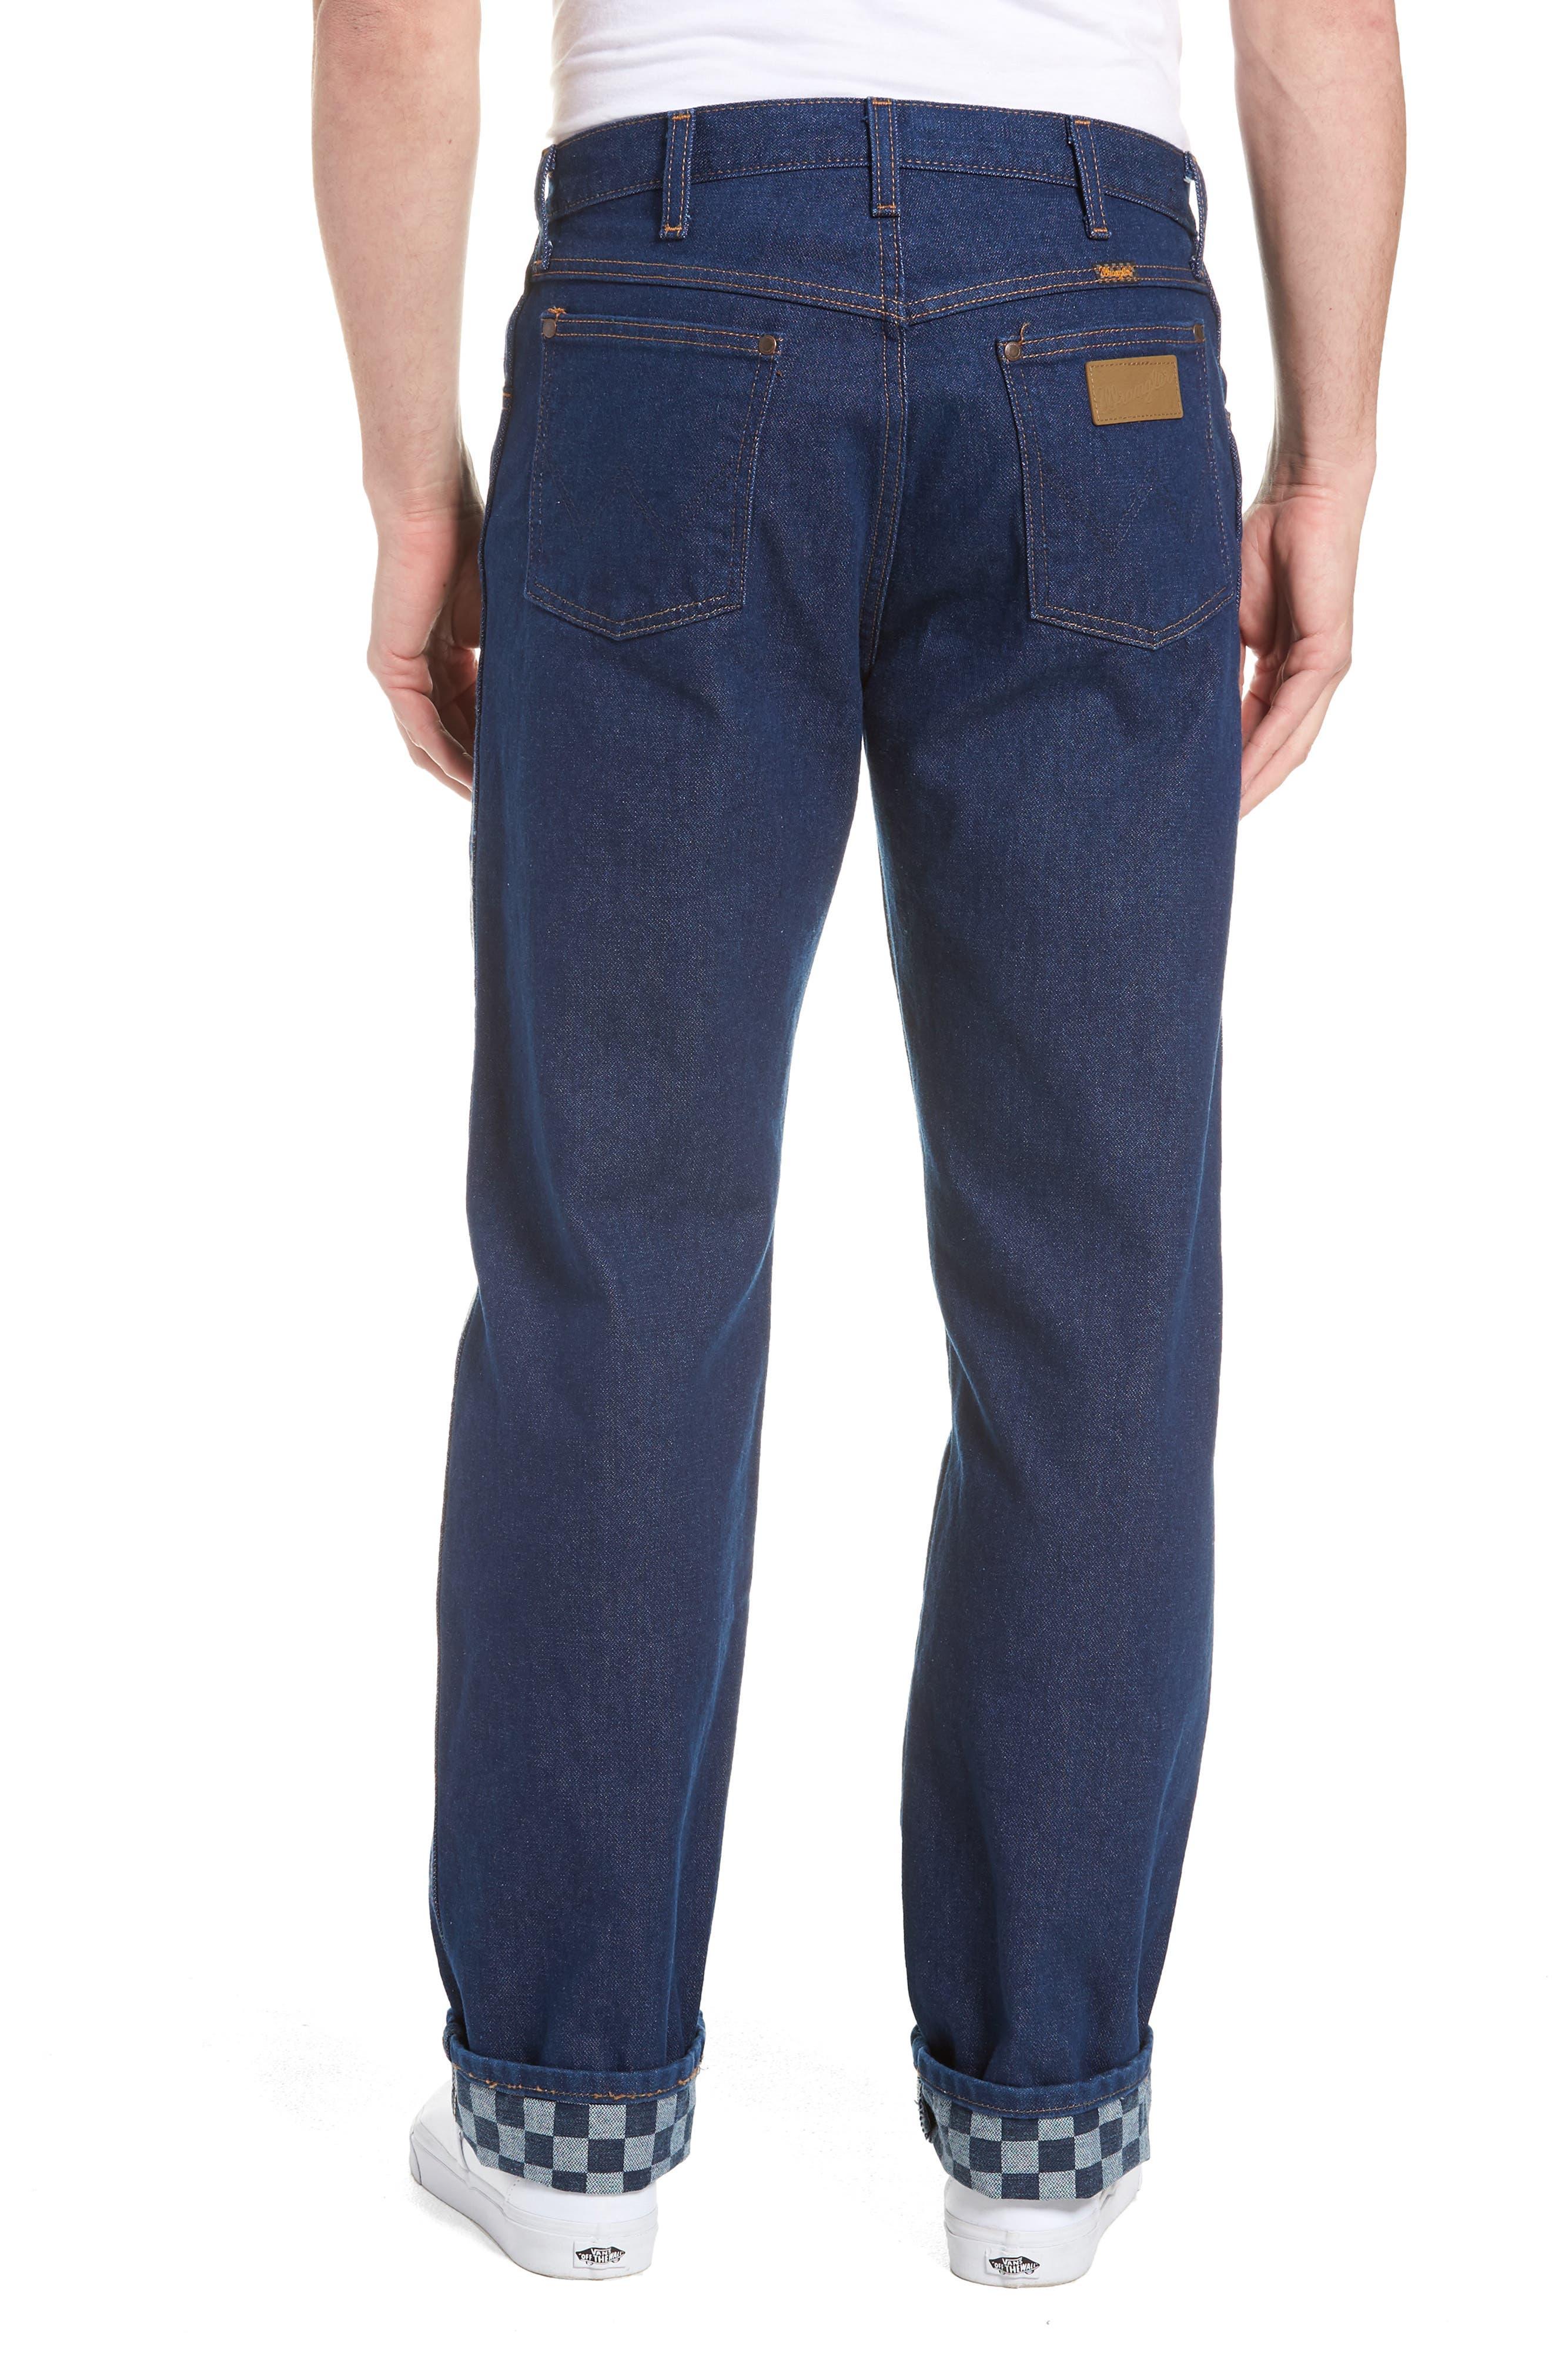 x Wrangler Straight Leg Jeans,                             Alternate thumbnail 2, color,                             PREWASH INDIGO